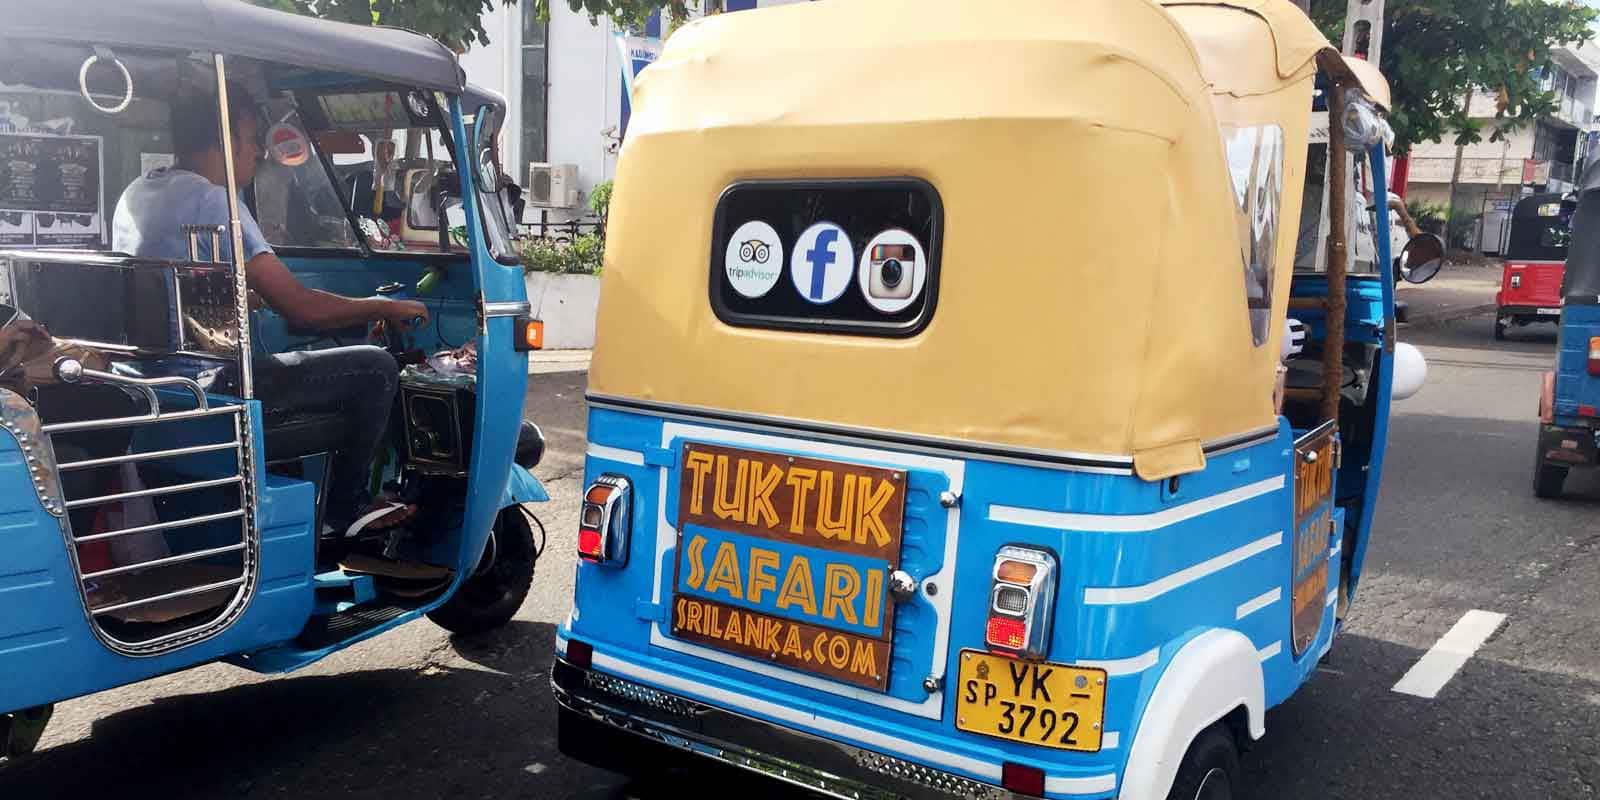 Don't forget about Colombo, the capital of Sri Lanka! See all this bustling city has to offer via a tuk tuk with Tuk Tuk Safari Sri Lanka.